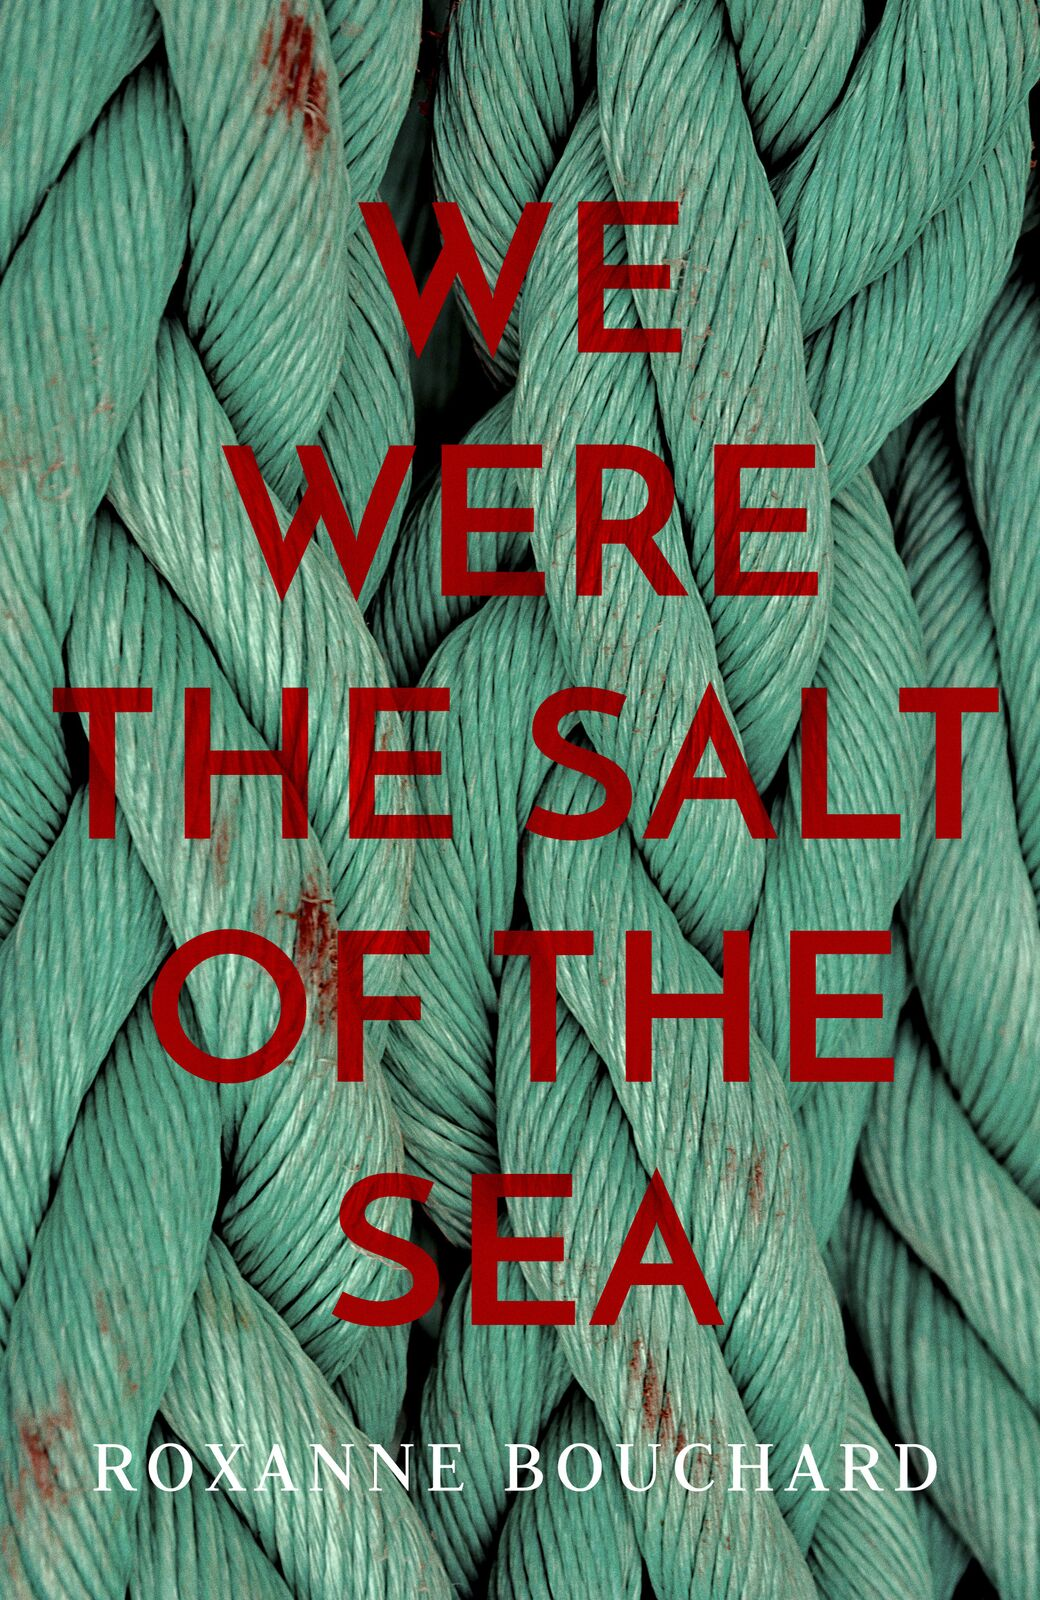 salt-of-the-sea-cover-vis-preview_orig.jpeg